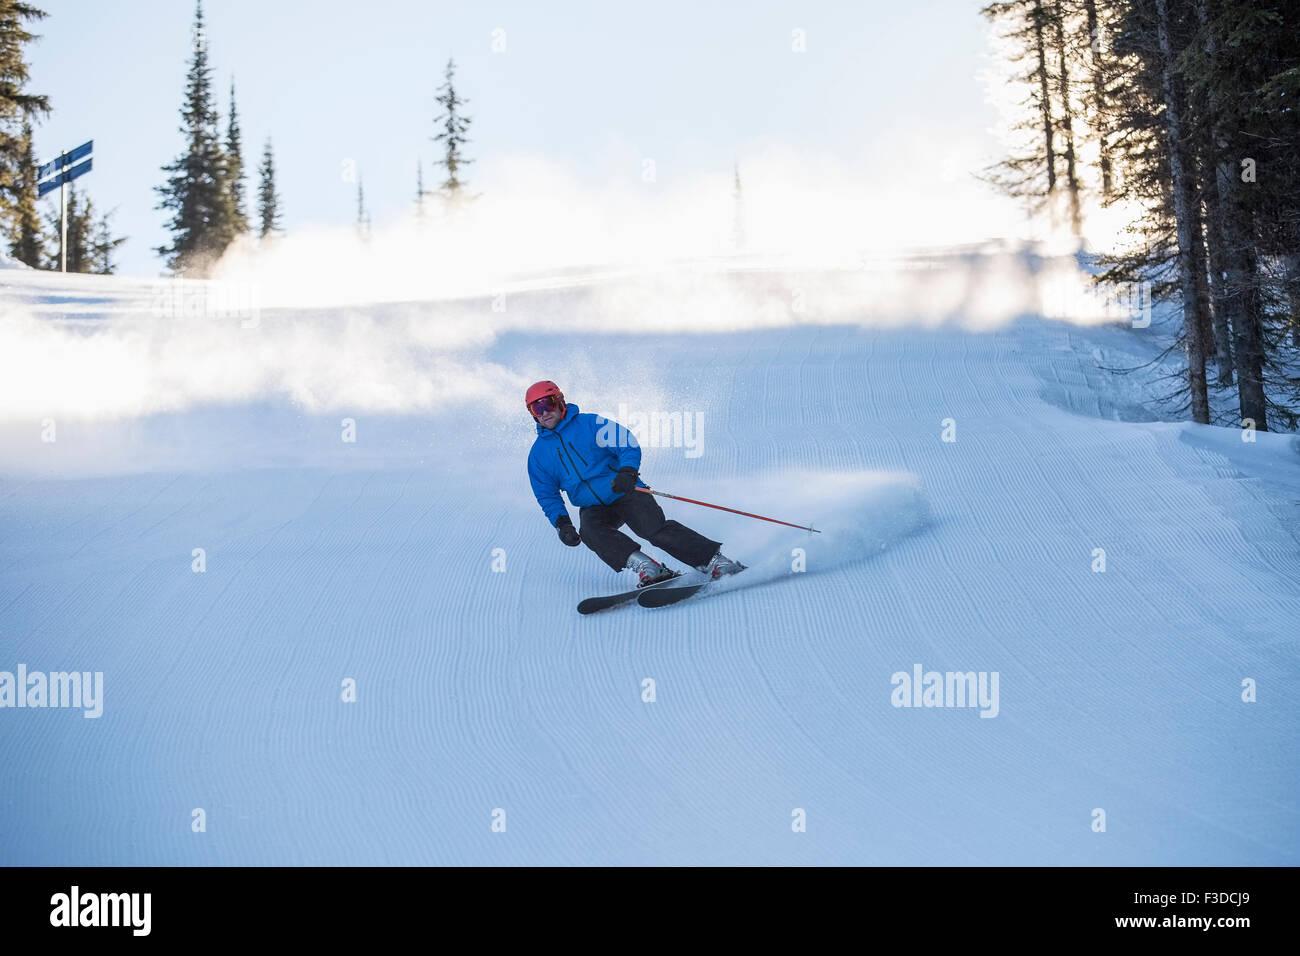 Man skiing downhill - Stock Image